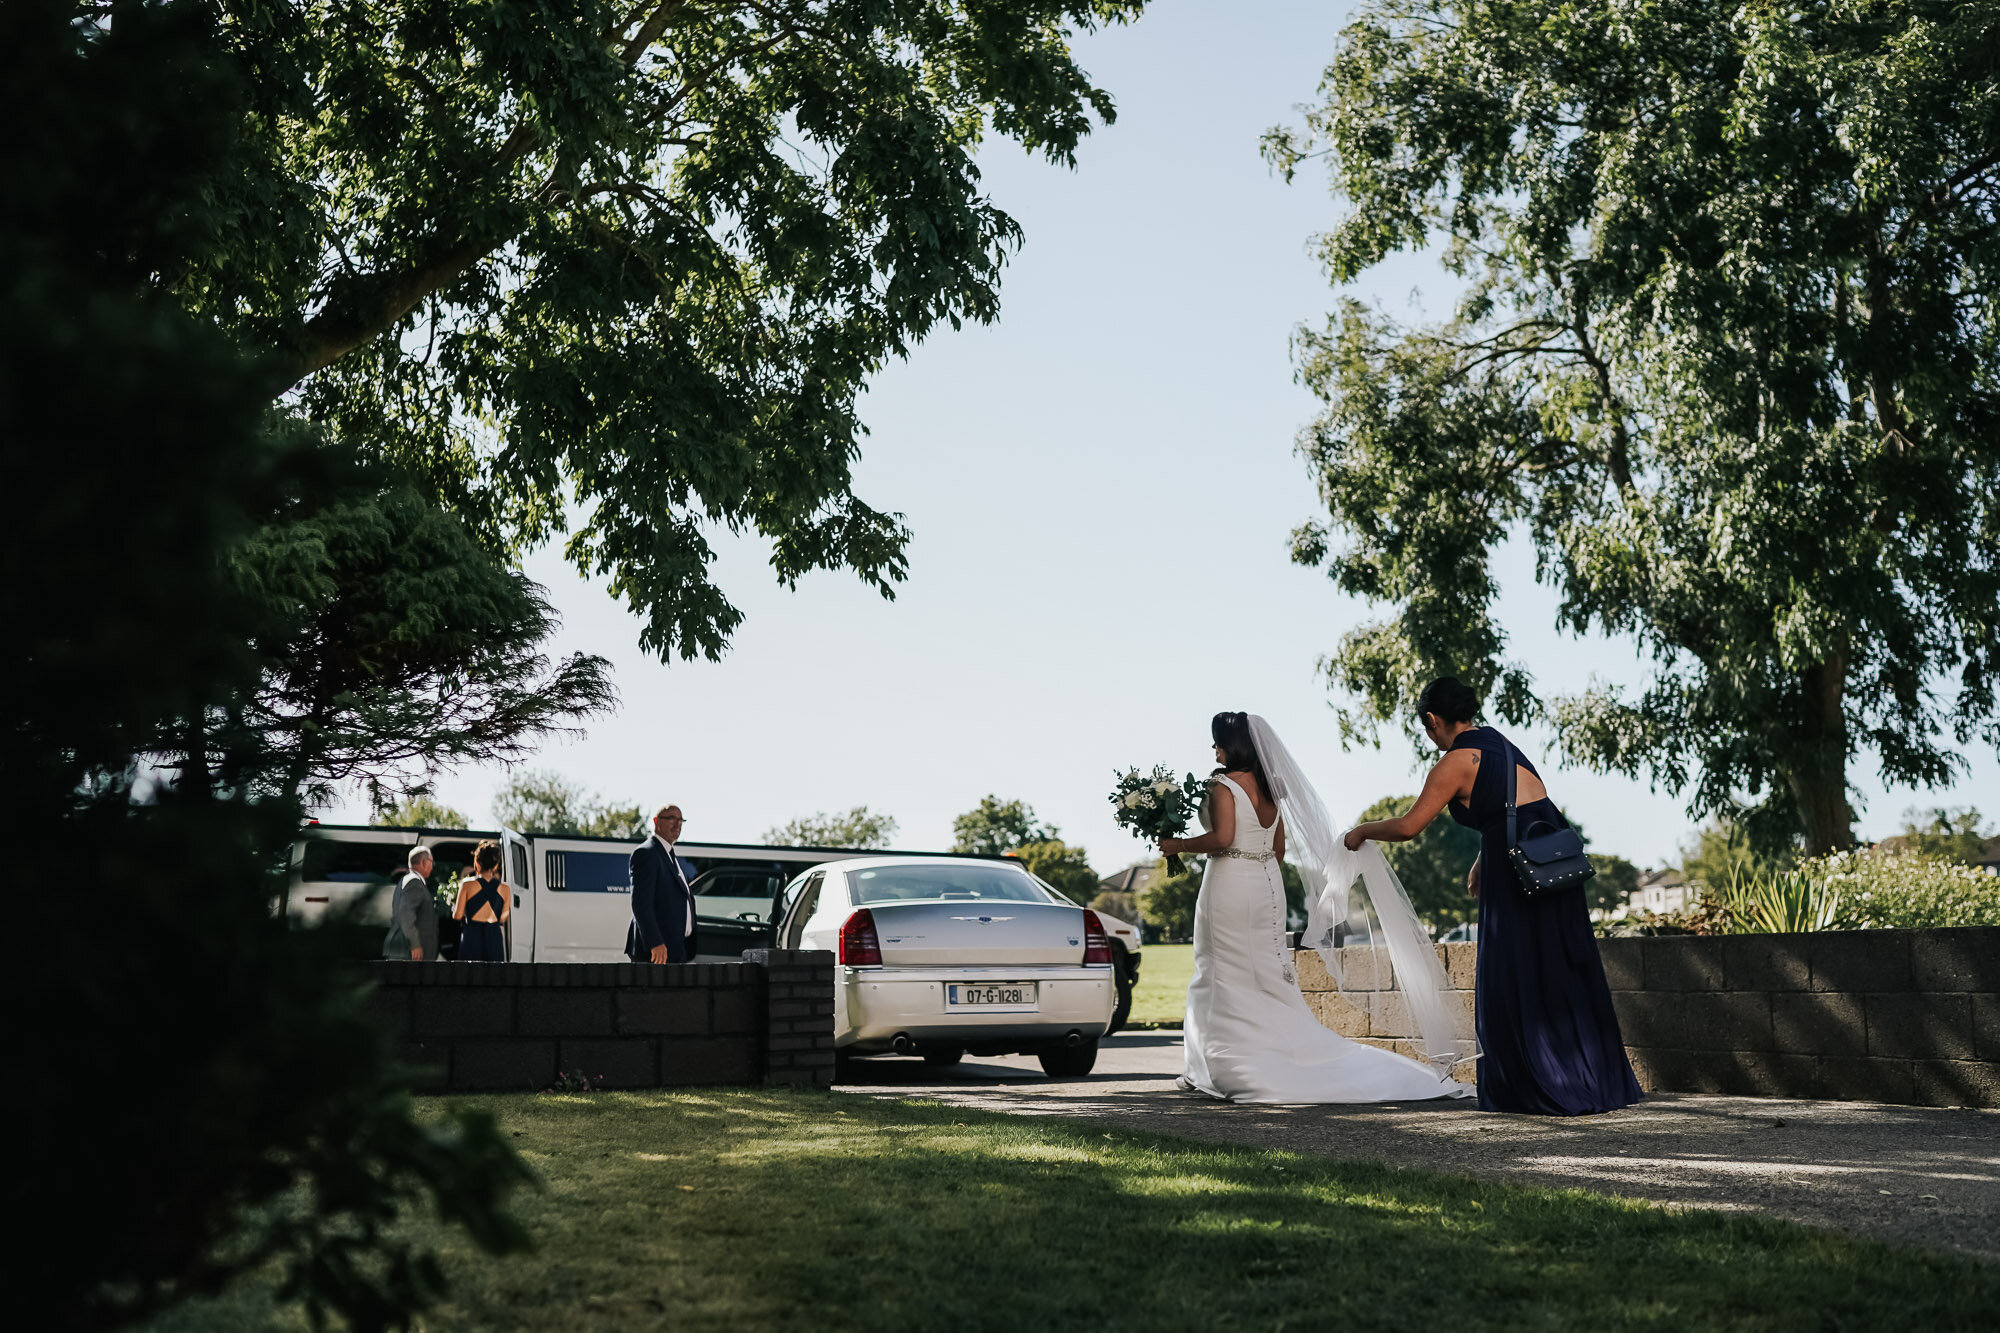 Clontarf Caste wedding photographer Wedding Photography dublin ireland wedding photographer (15 of 58).jpg